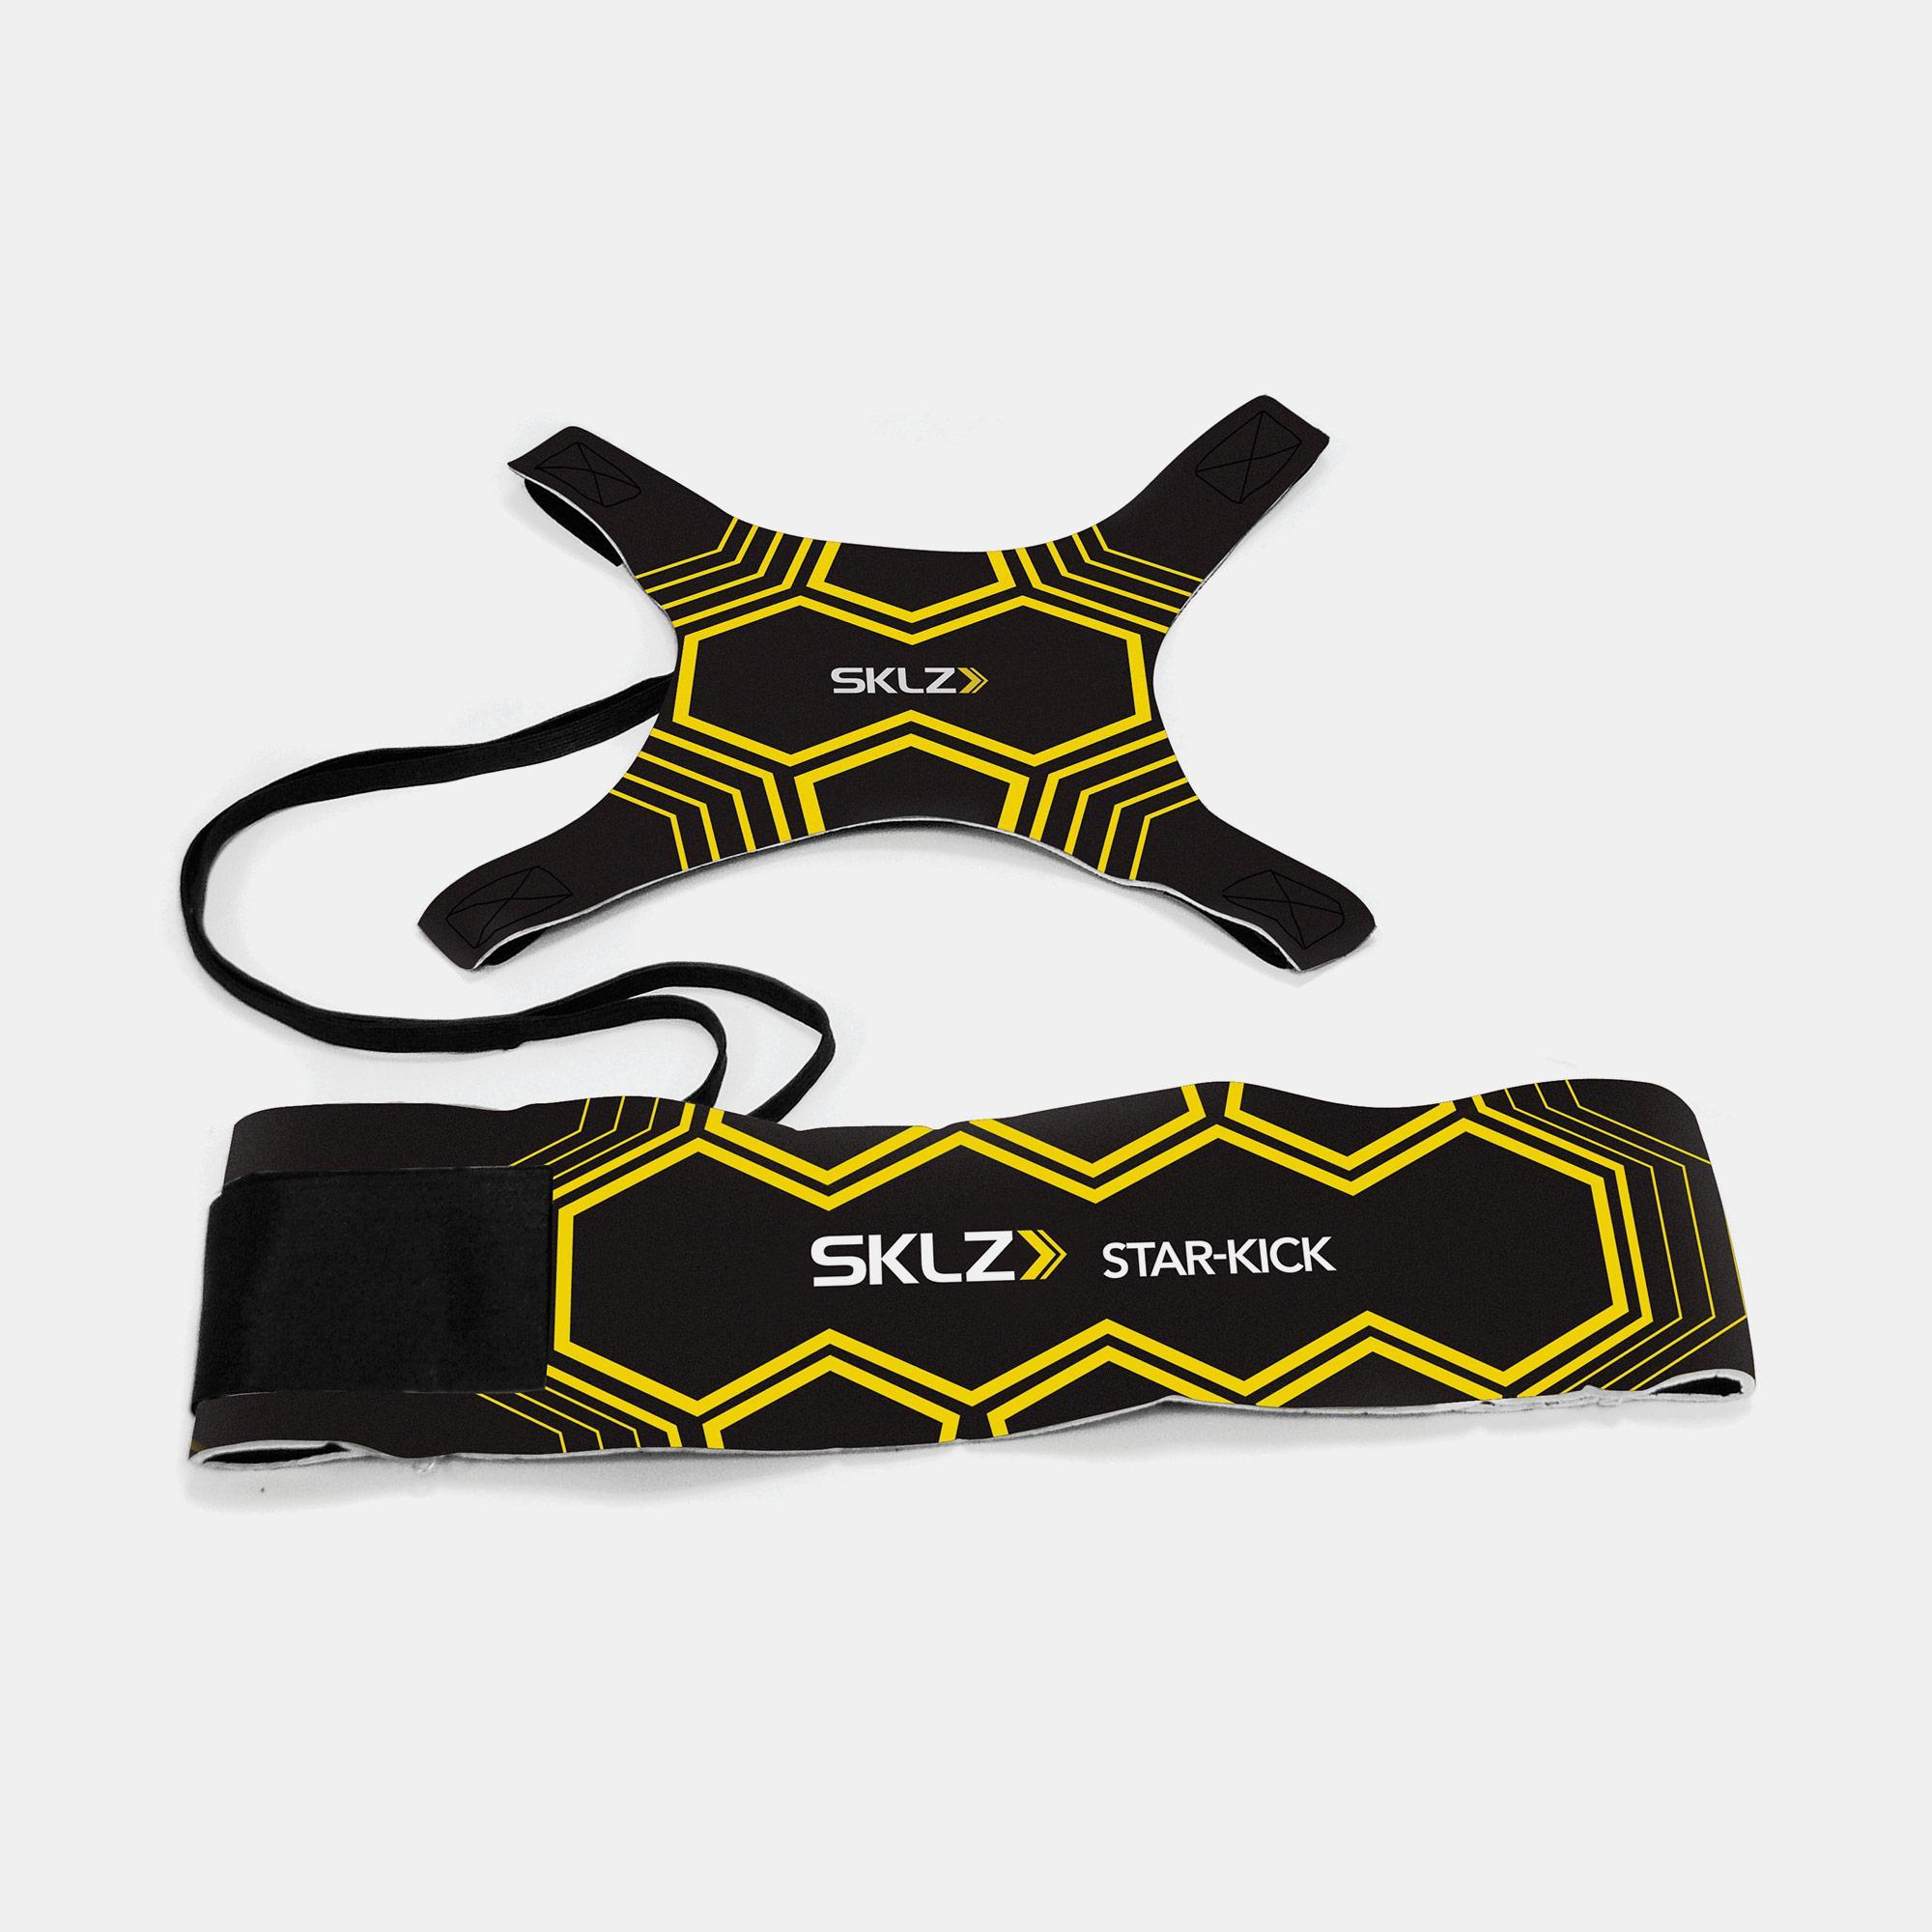 Balance Ball Kick: SKLZ Star Kick Stretch Solo Sport Exercise Aid Soccer Ball